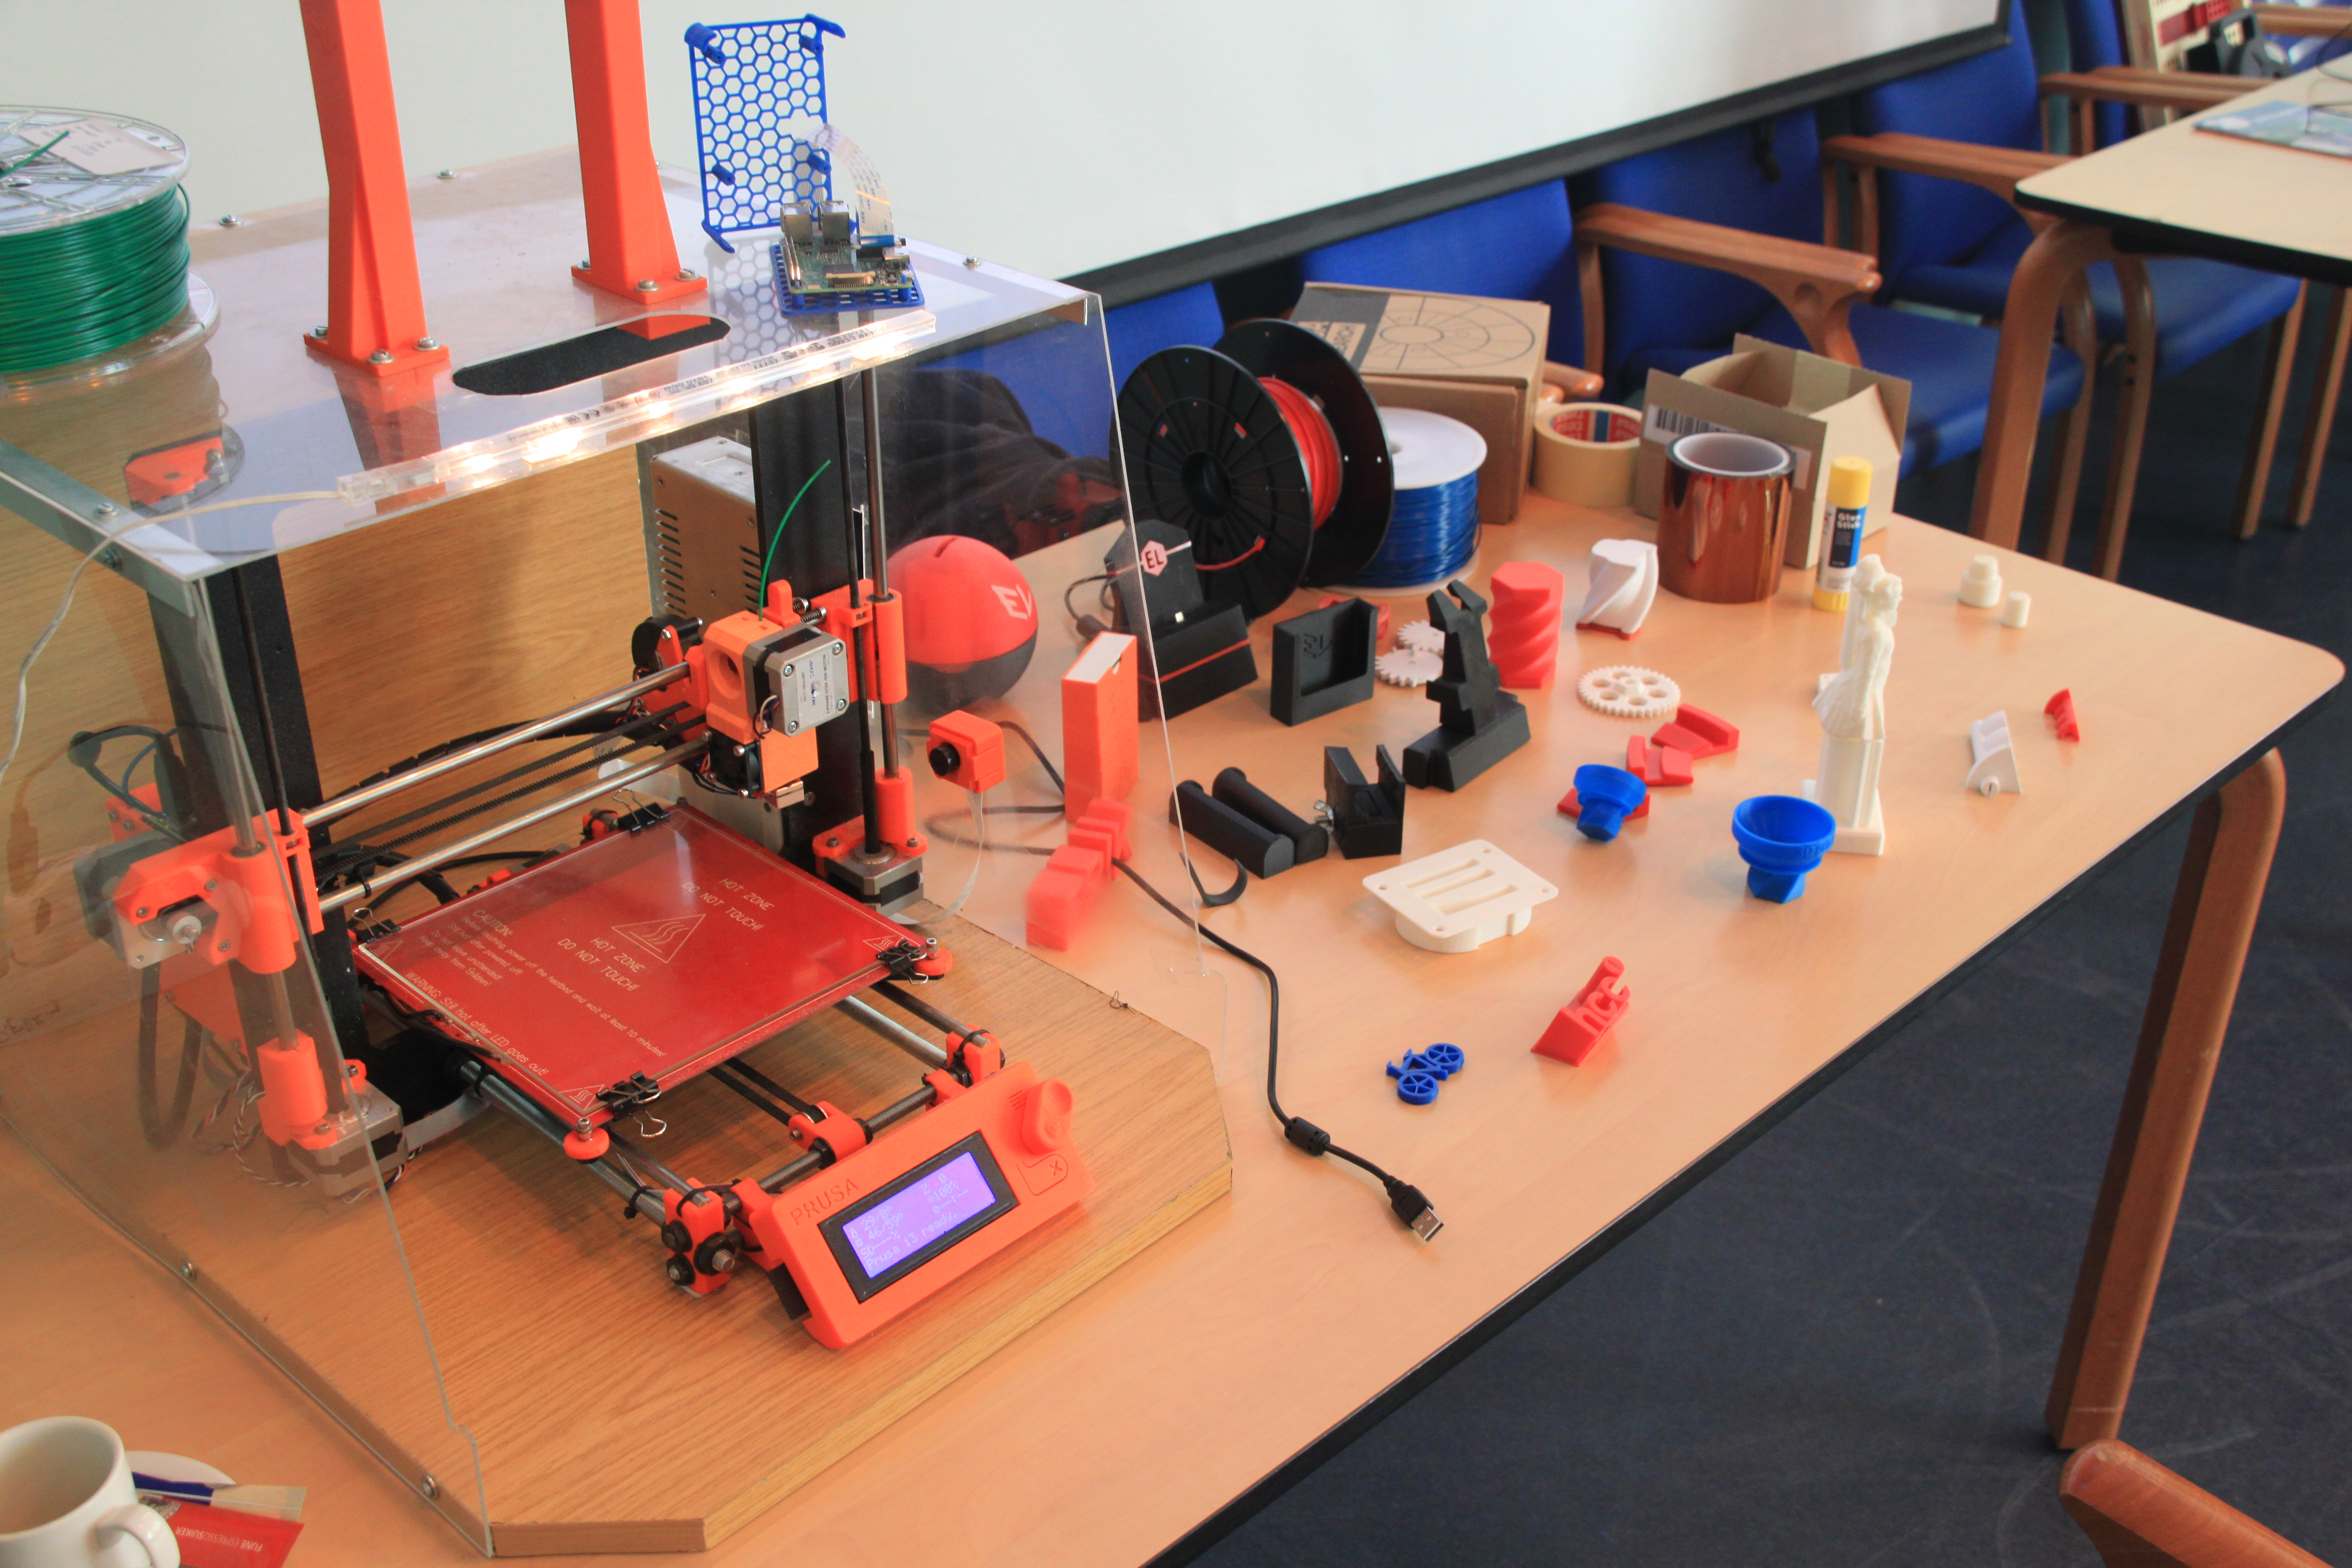 2017-06-07 - 05 - 3D printing demo HCC!Noord-Limburg